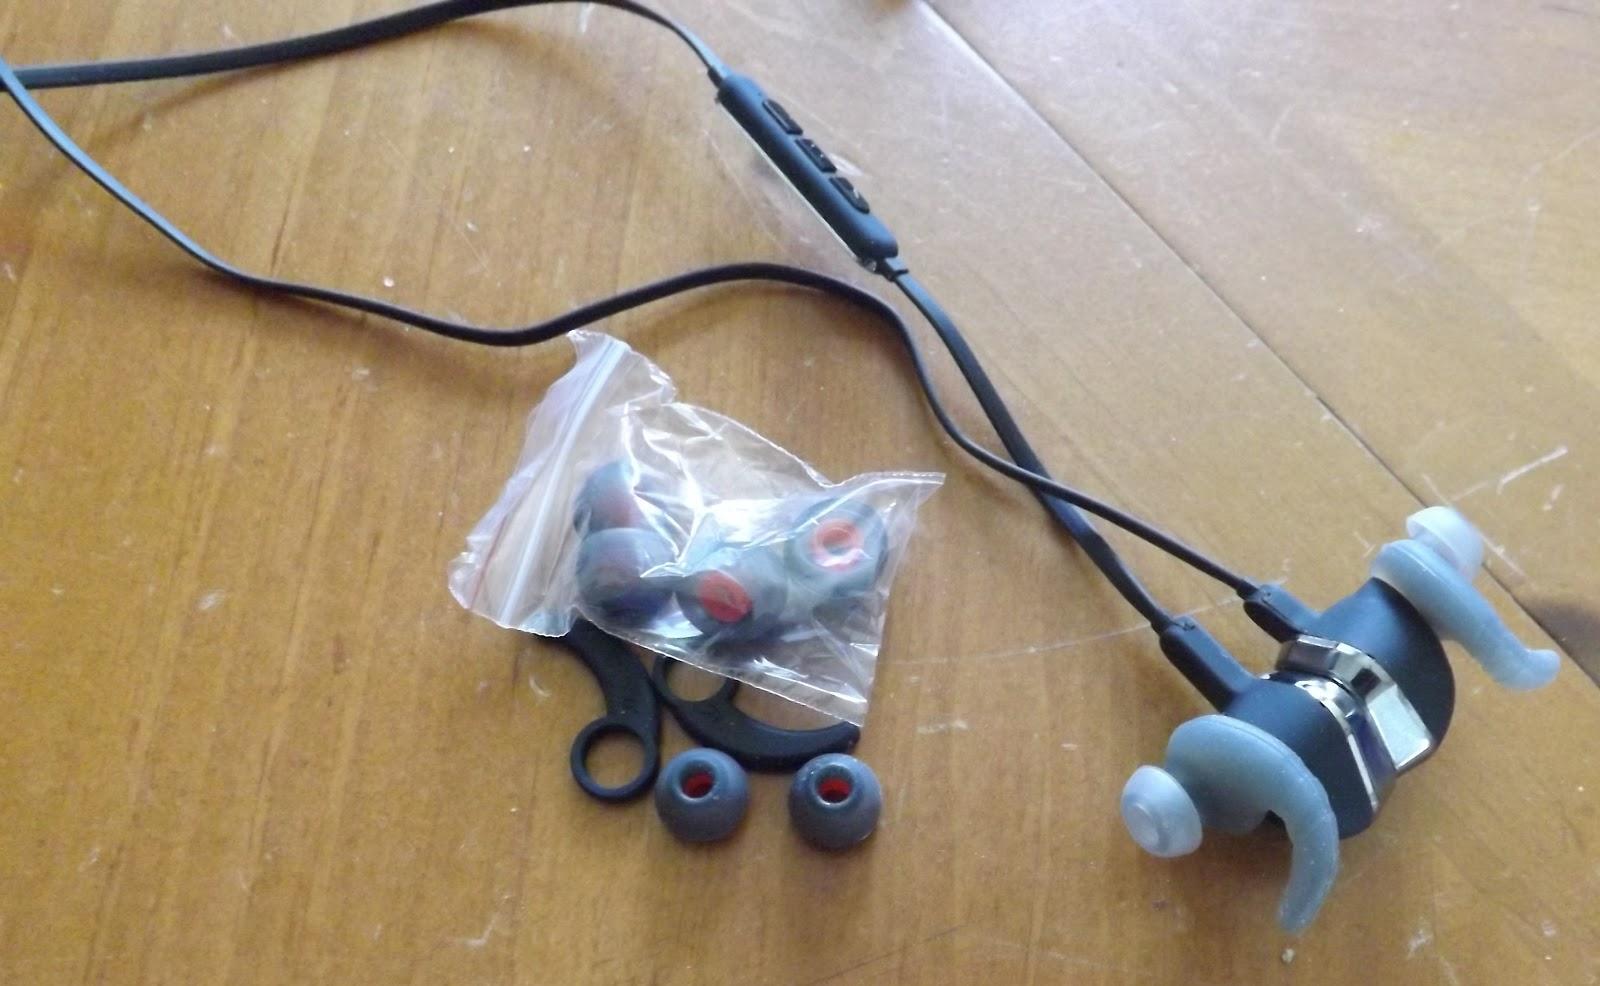 Walts Reviews Karnotech Remax Magnet Sports Earbuds Bluetooth Earphones 4 1 General Stereo Earphones Rm S2